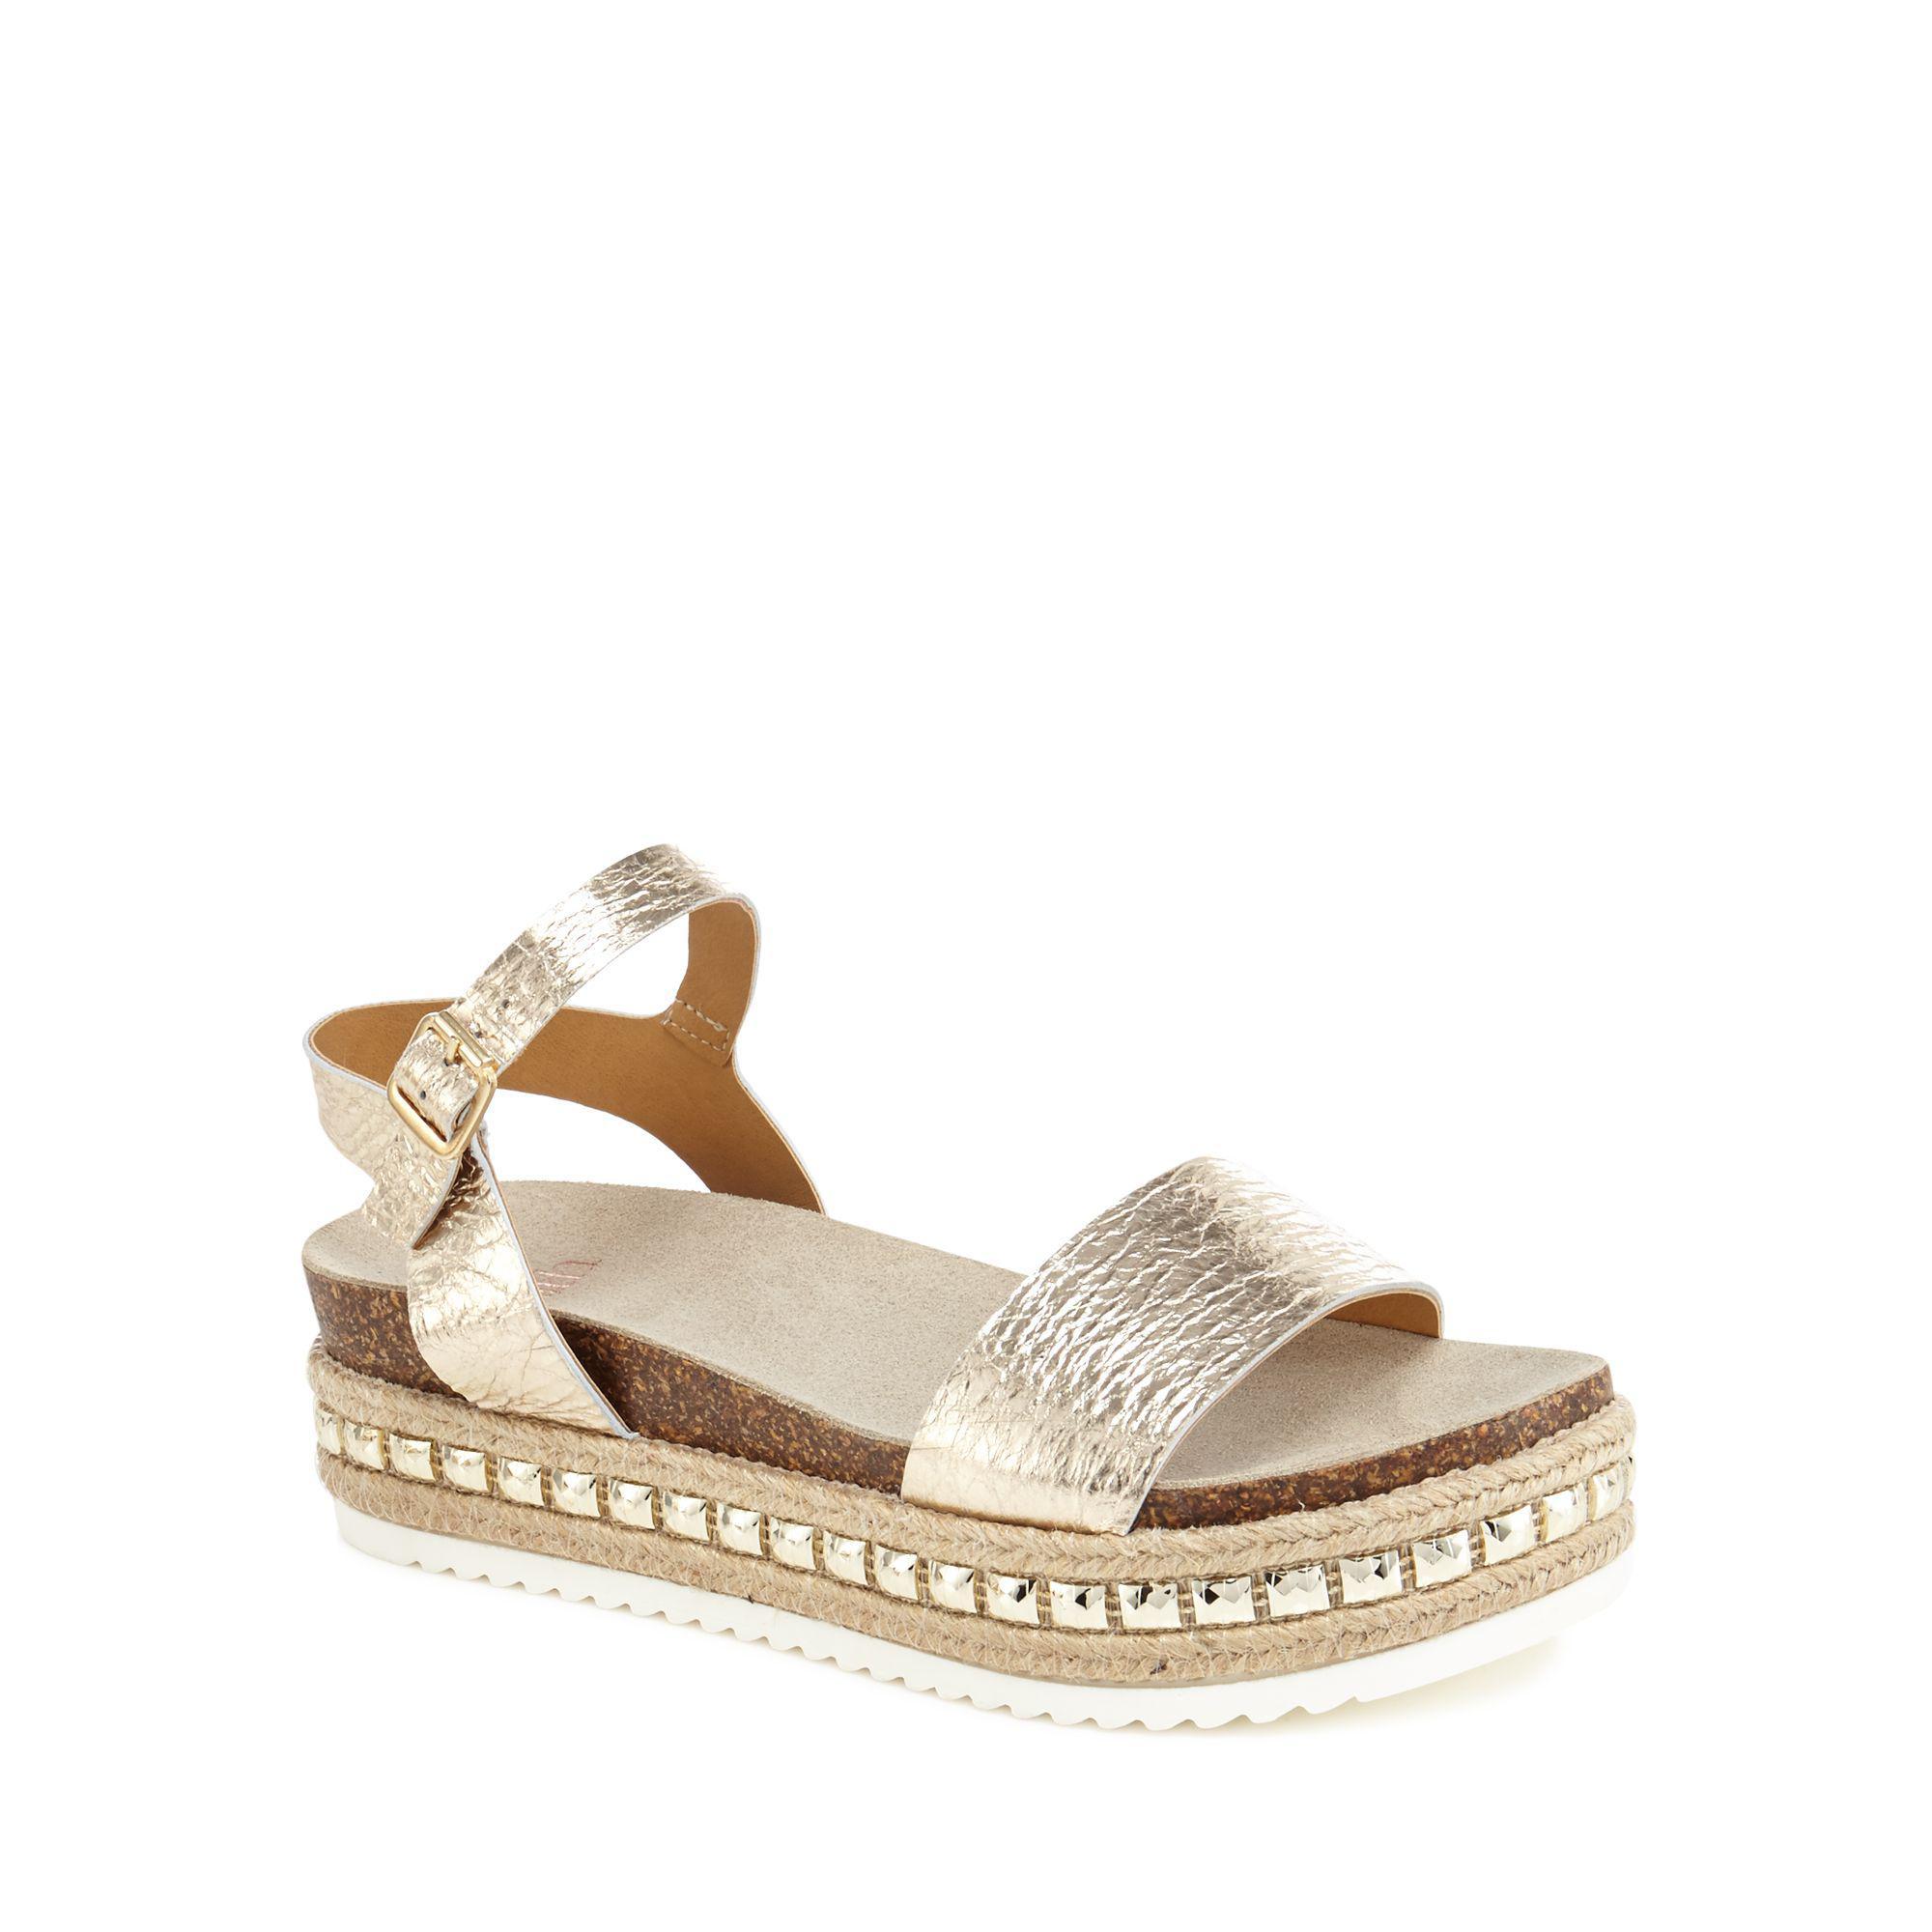 6bf29c0fd28 Faith - Metallic Gold Leather  jossy  Mid Flatform Heel Ankle Strap Sandals  - Lyst. View fullscreen